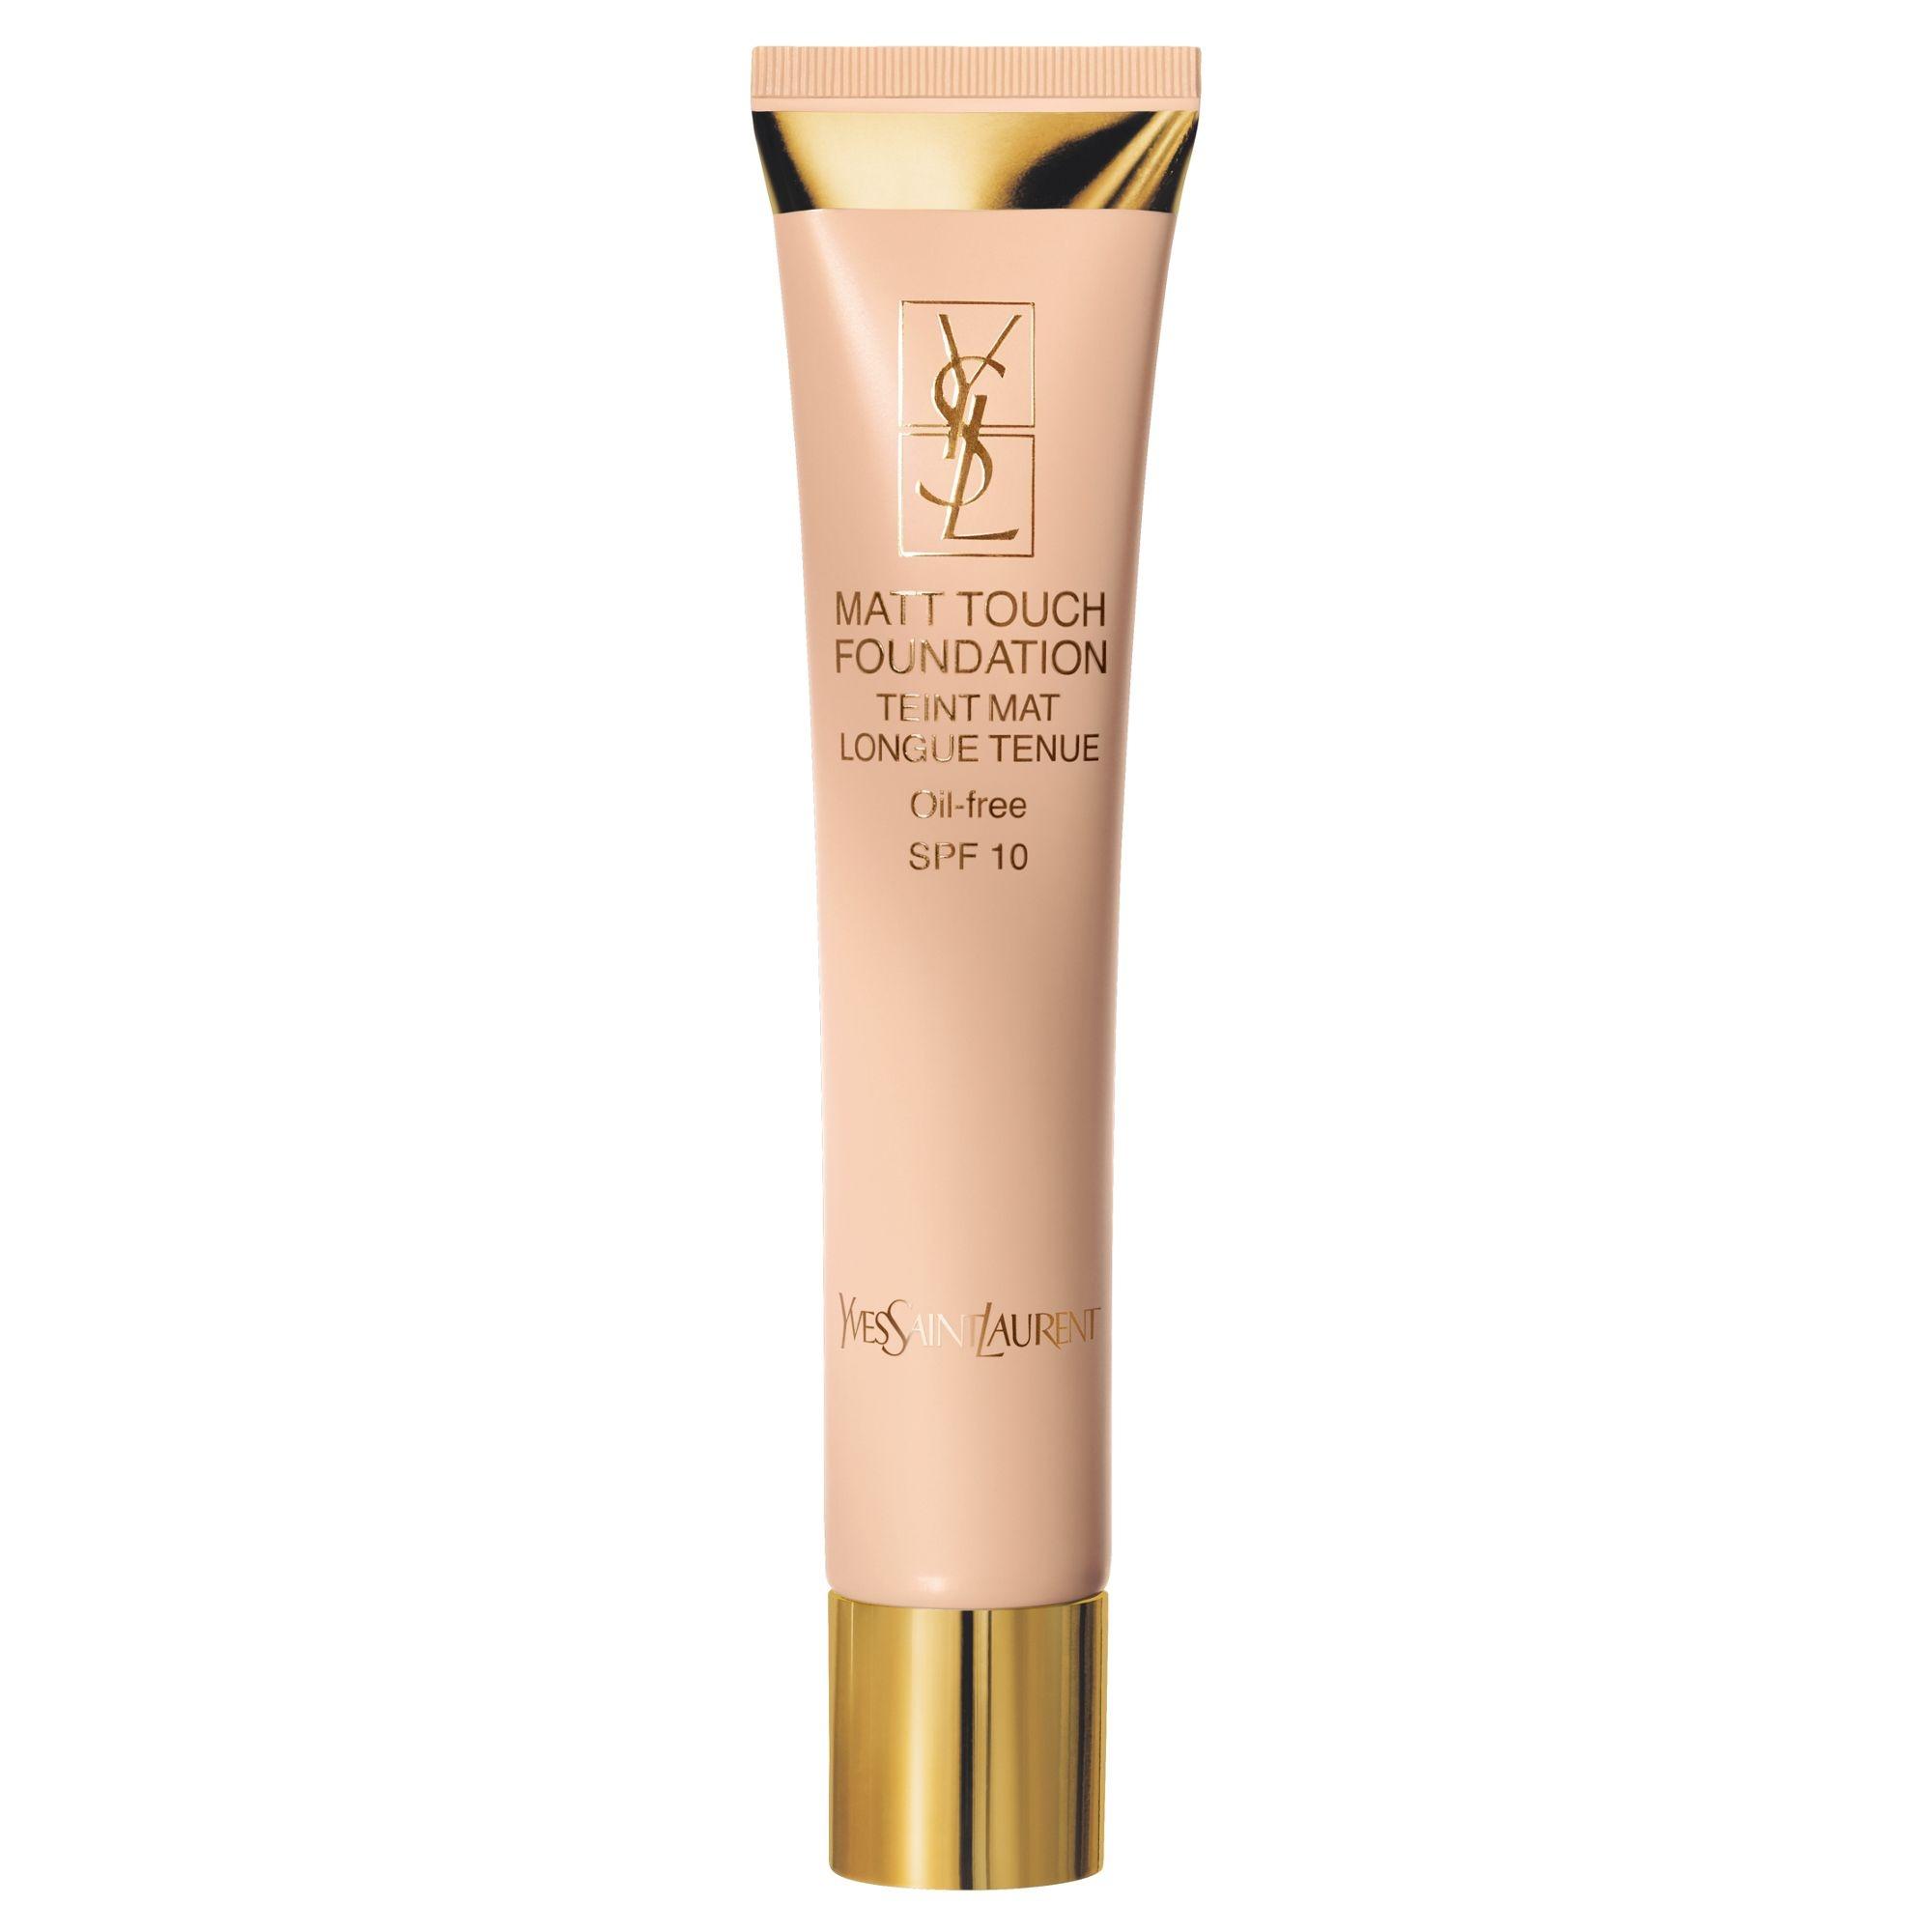 - Kosmetika - Yves Saint Laurent - Parfémy STAR